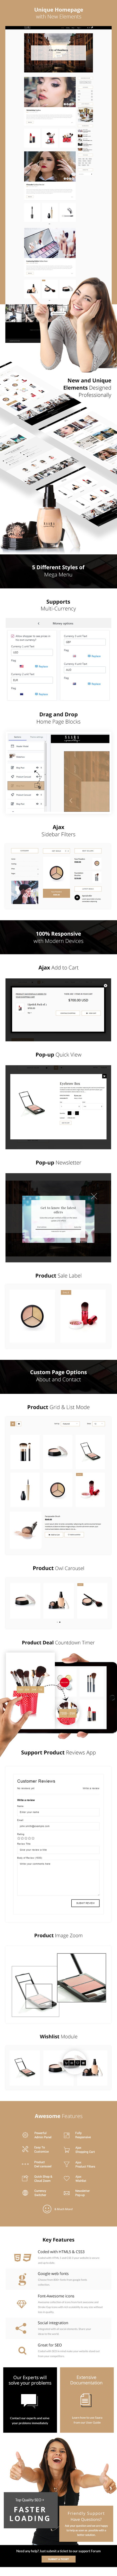 Saara - Blog, Store Shopify Theme - 1